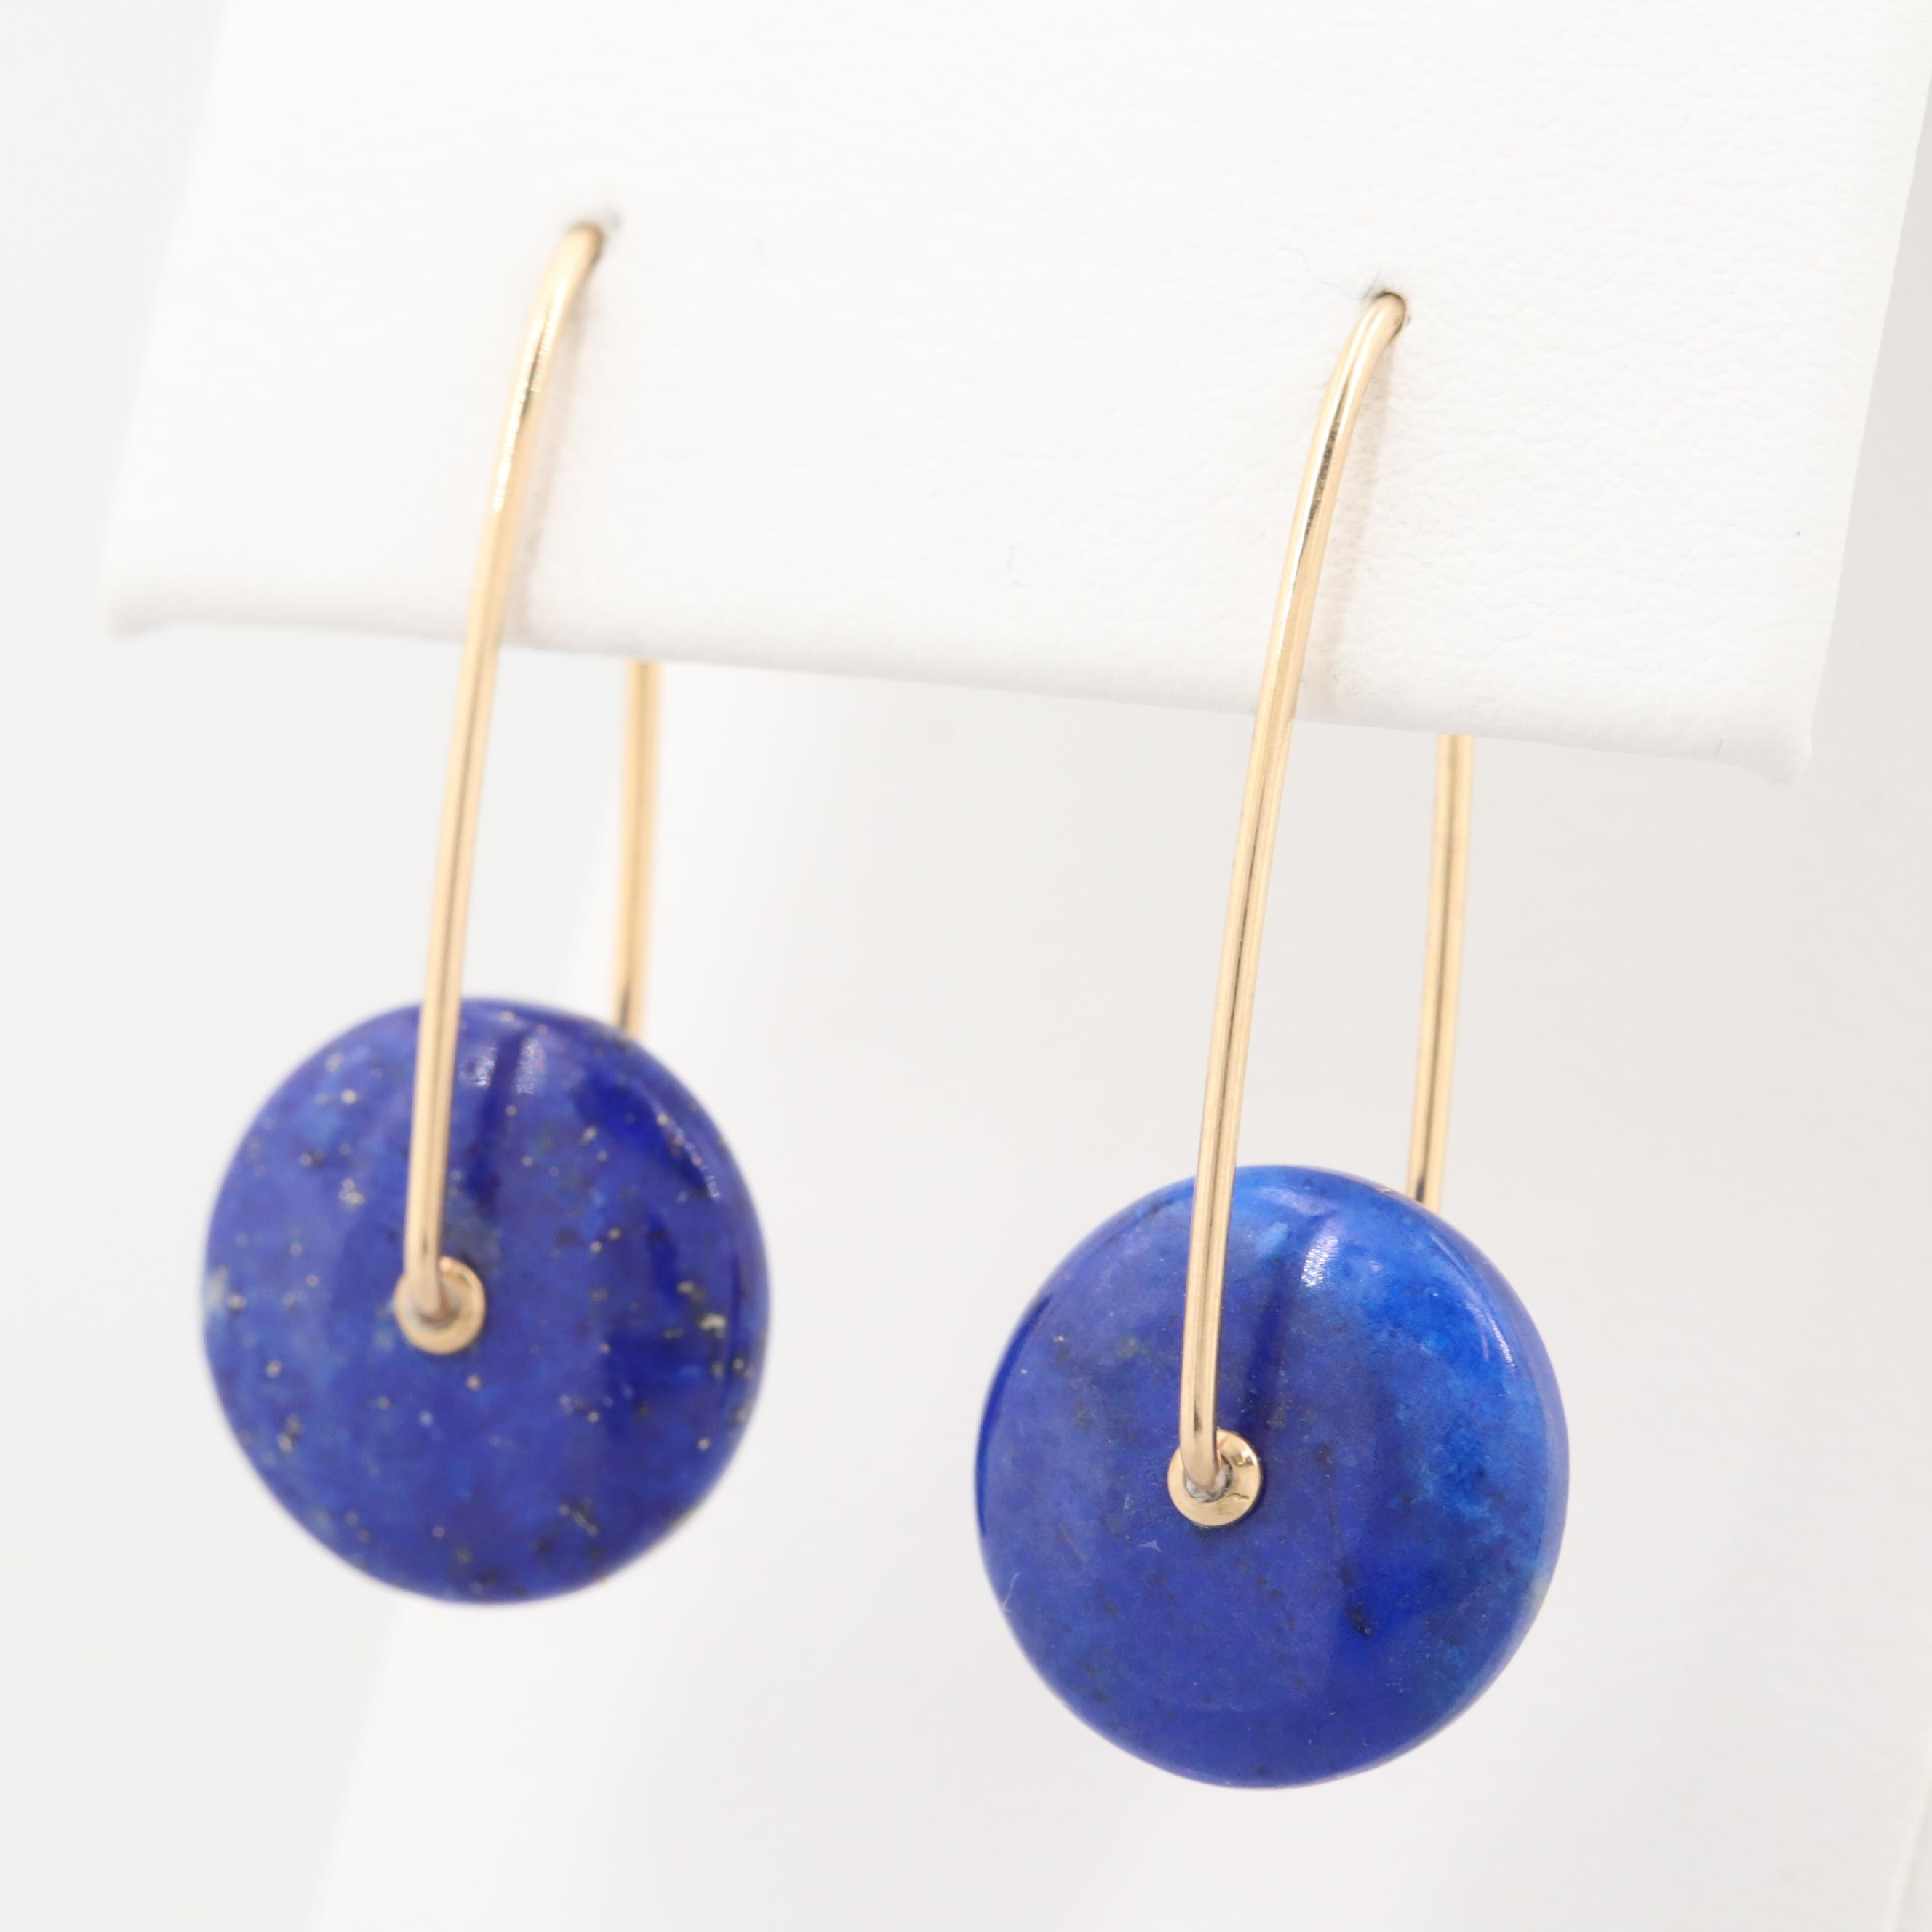 14K Yellow Gold Lapis Lazuli Drop Earrings